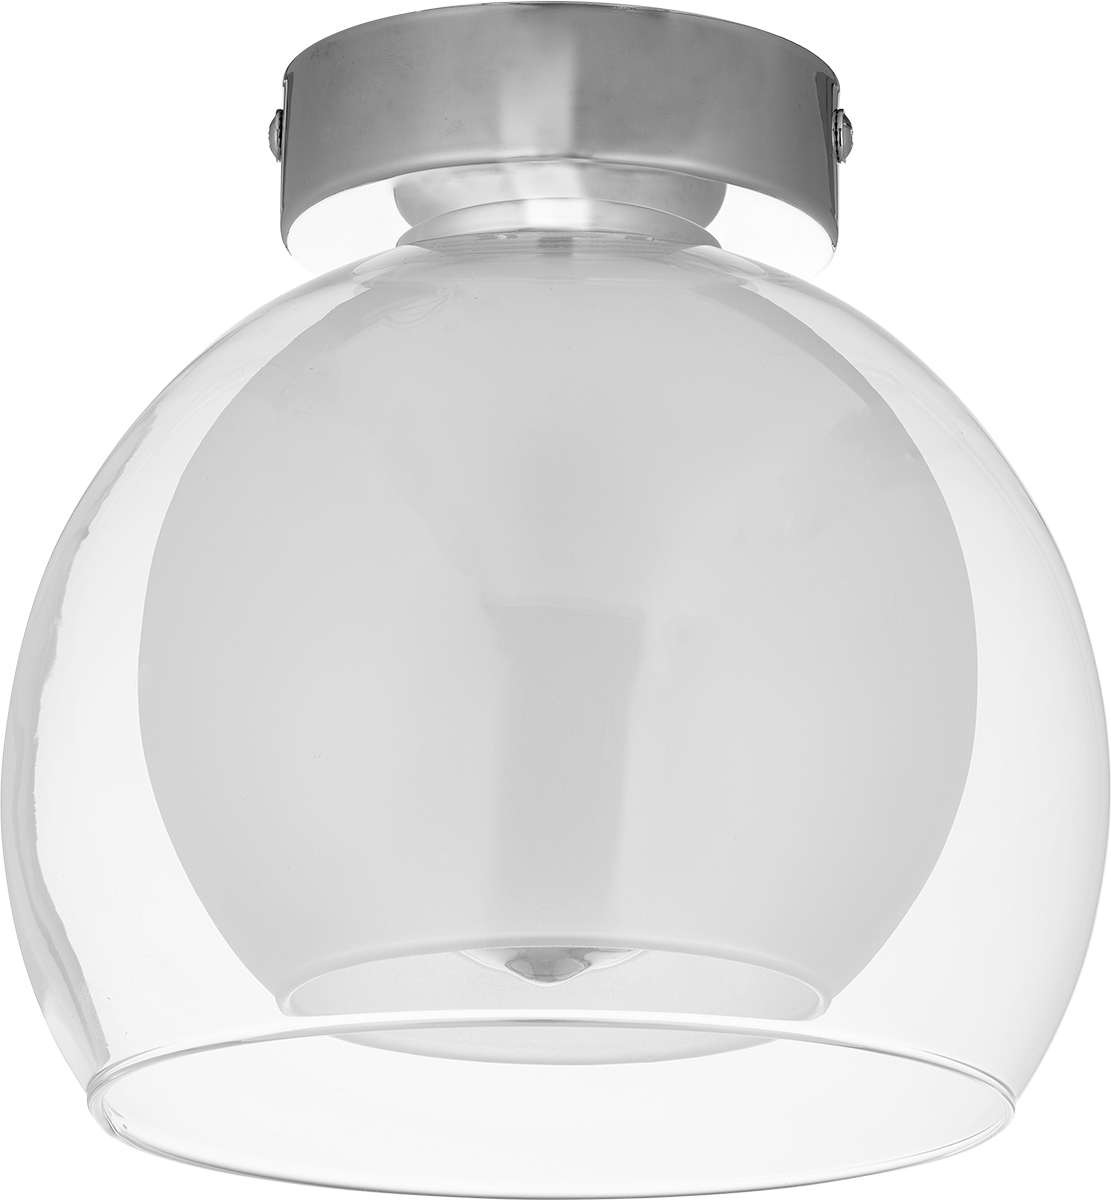 TK Lighting TK-2722 Napoli mennyezeti lámpa